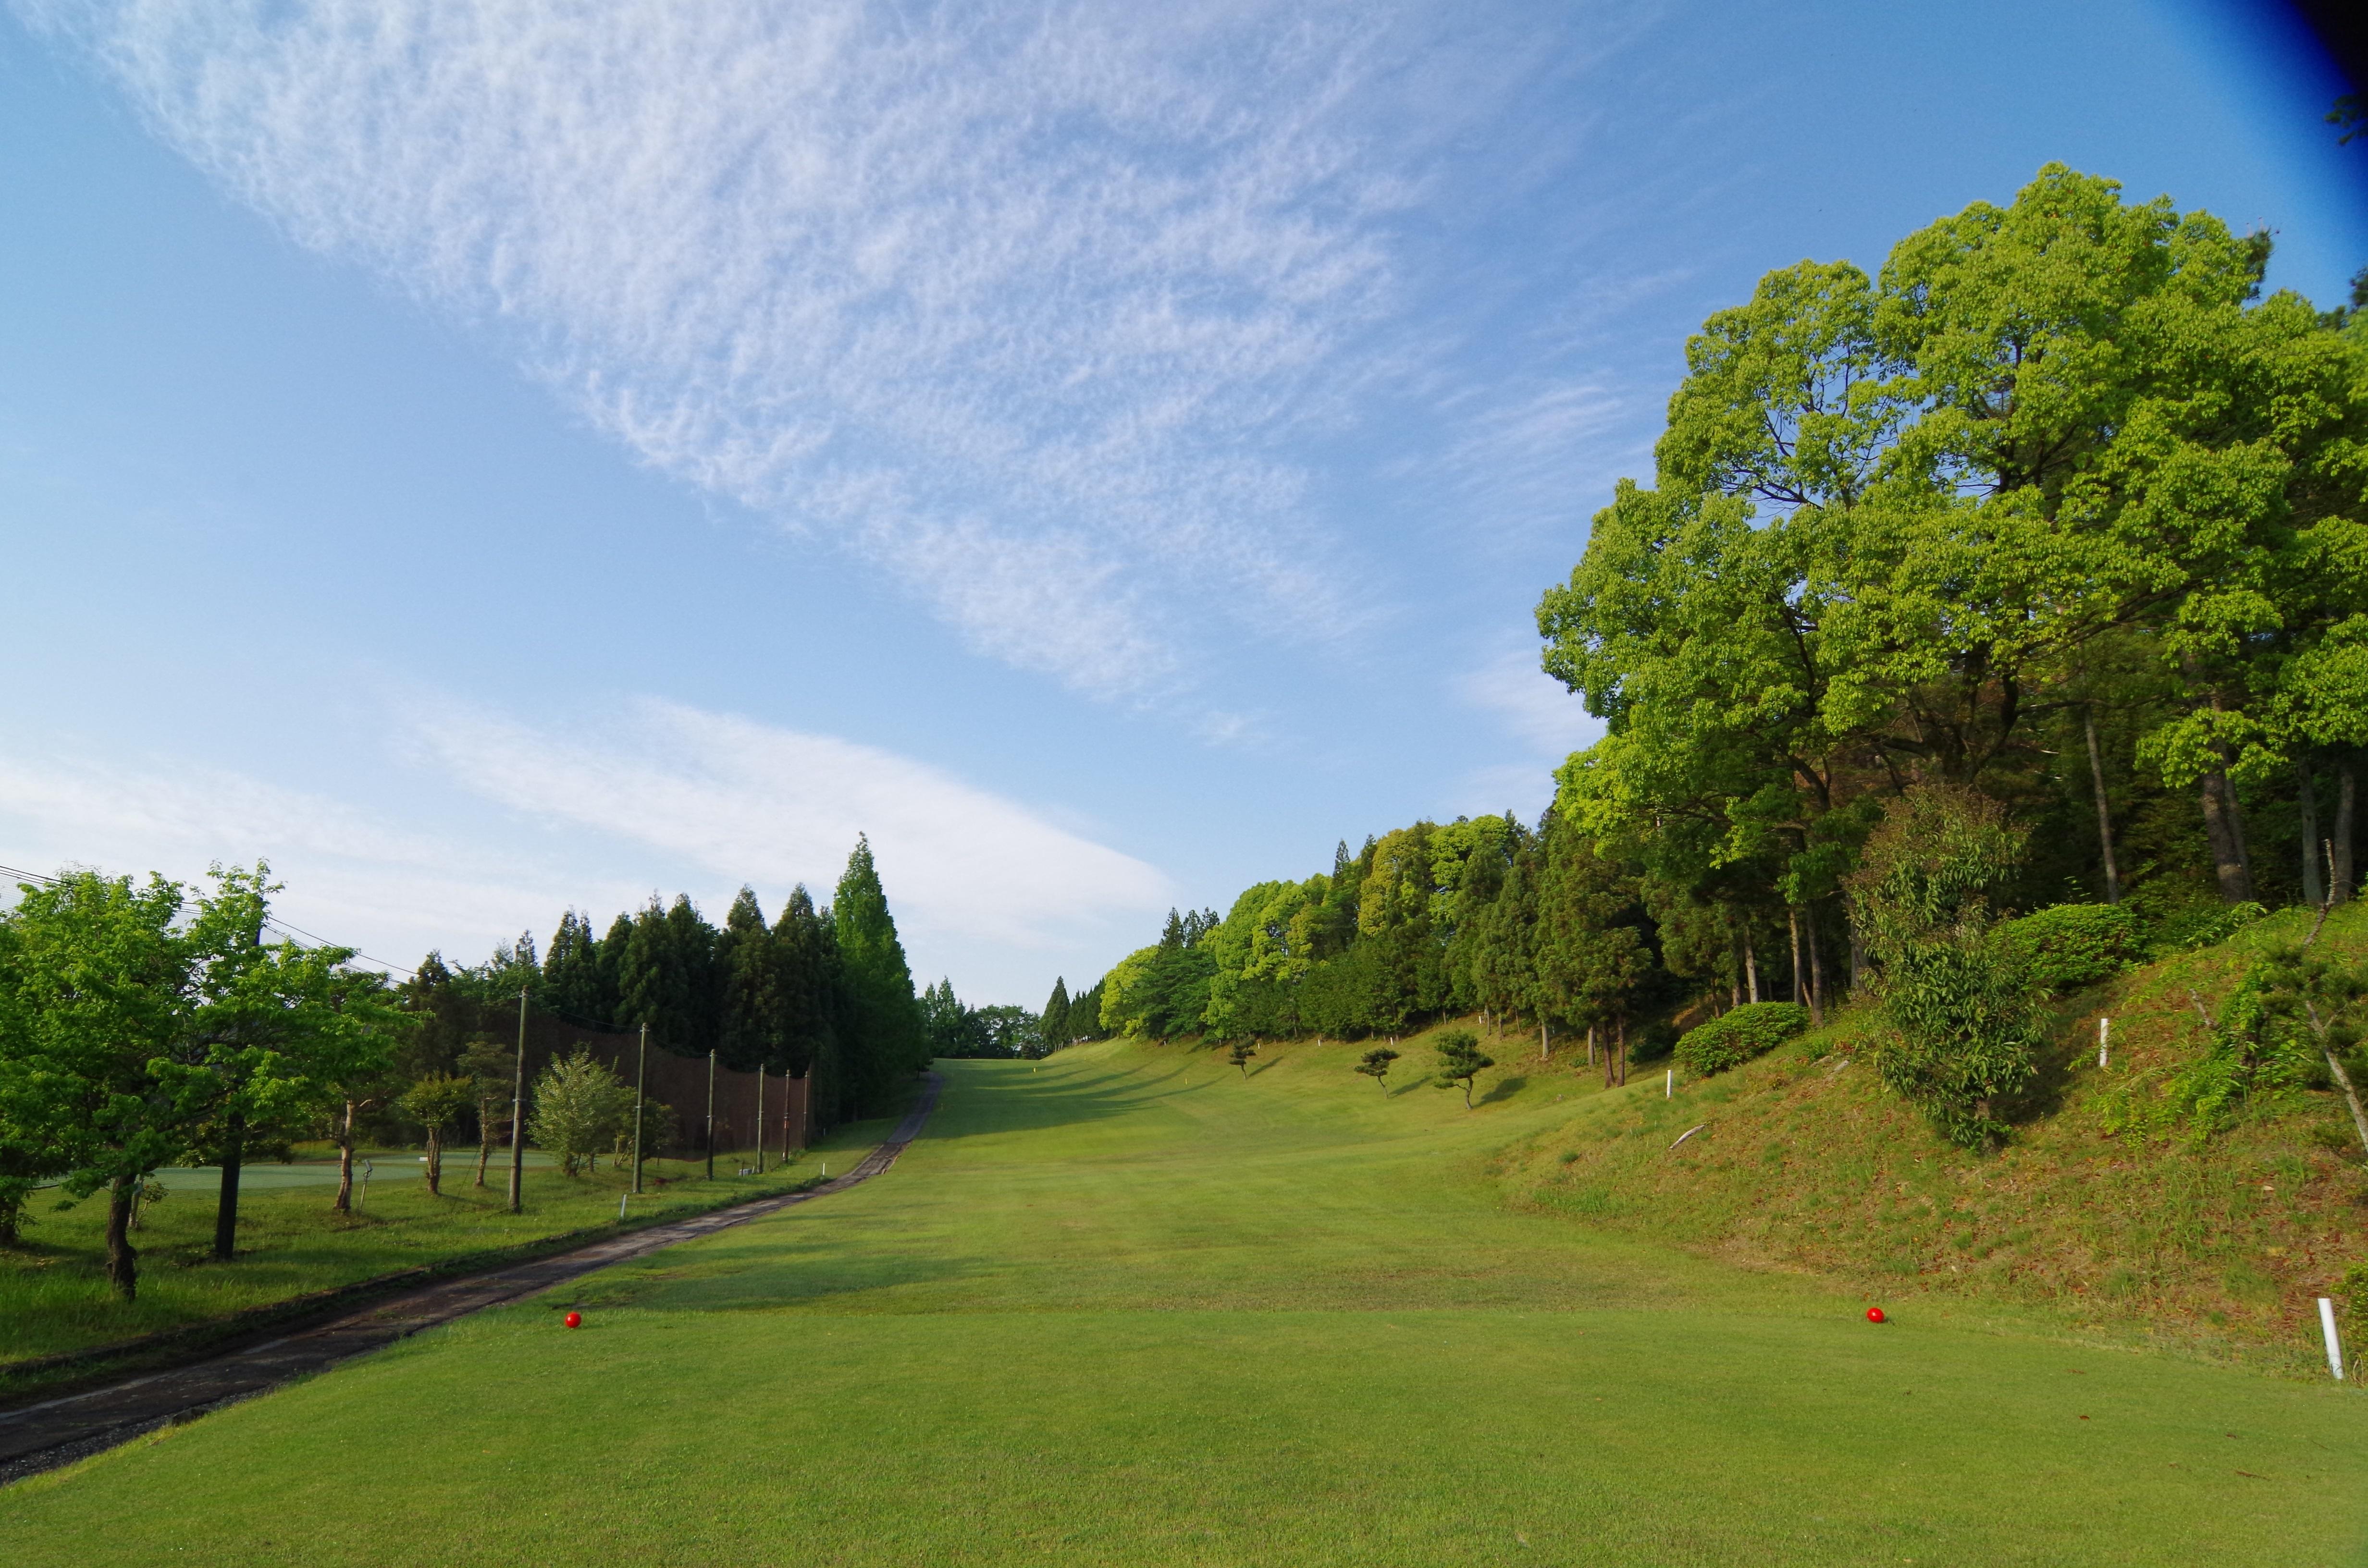 OGC岐阜中央ゴルフパーク(アイランド岐阜中央)